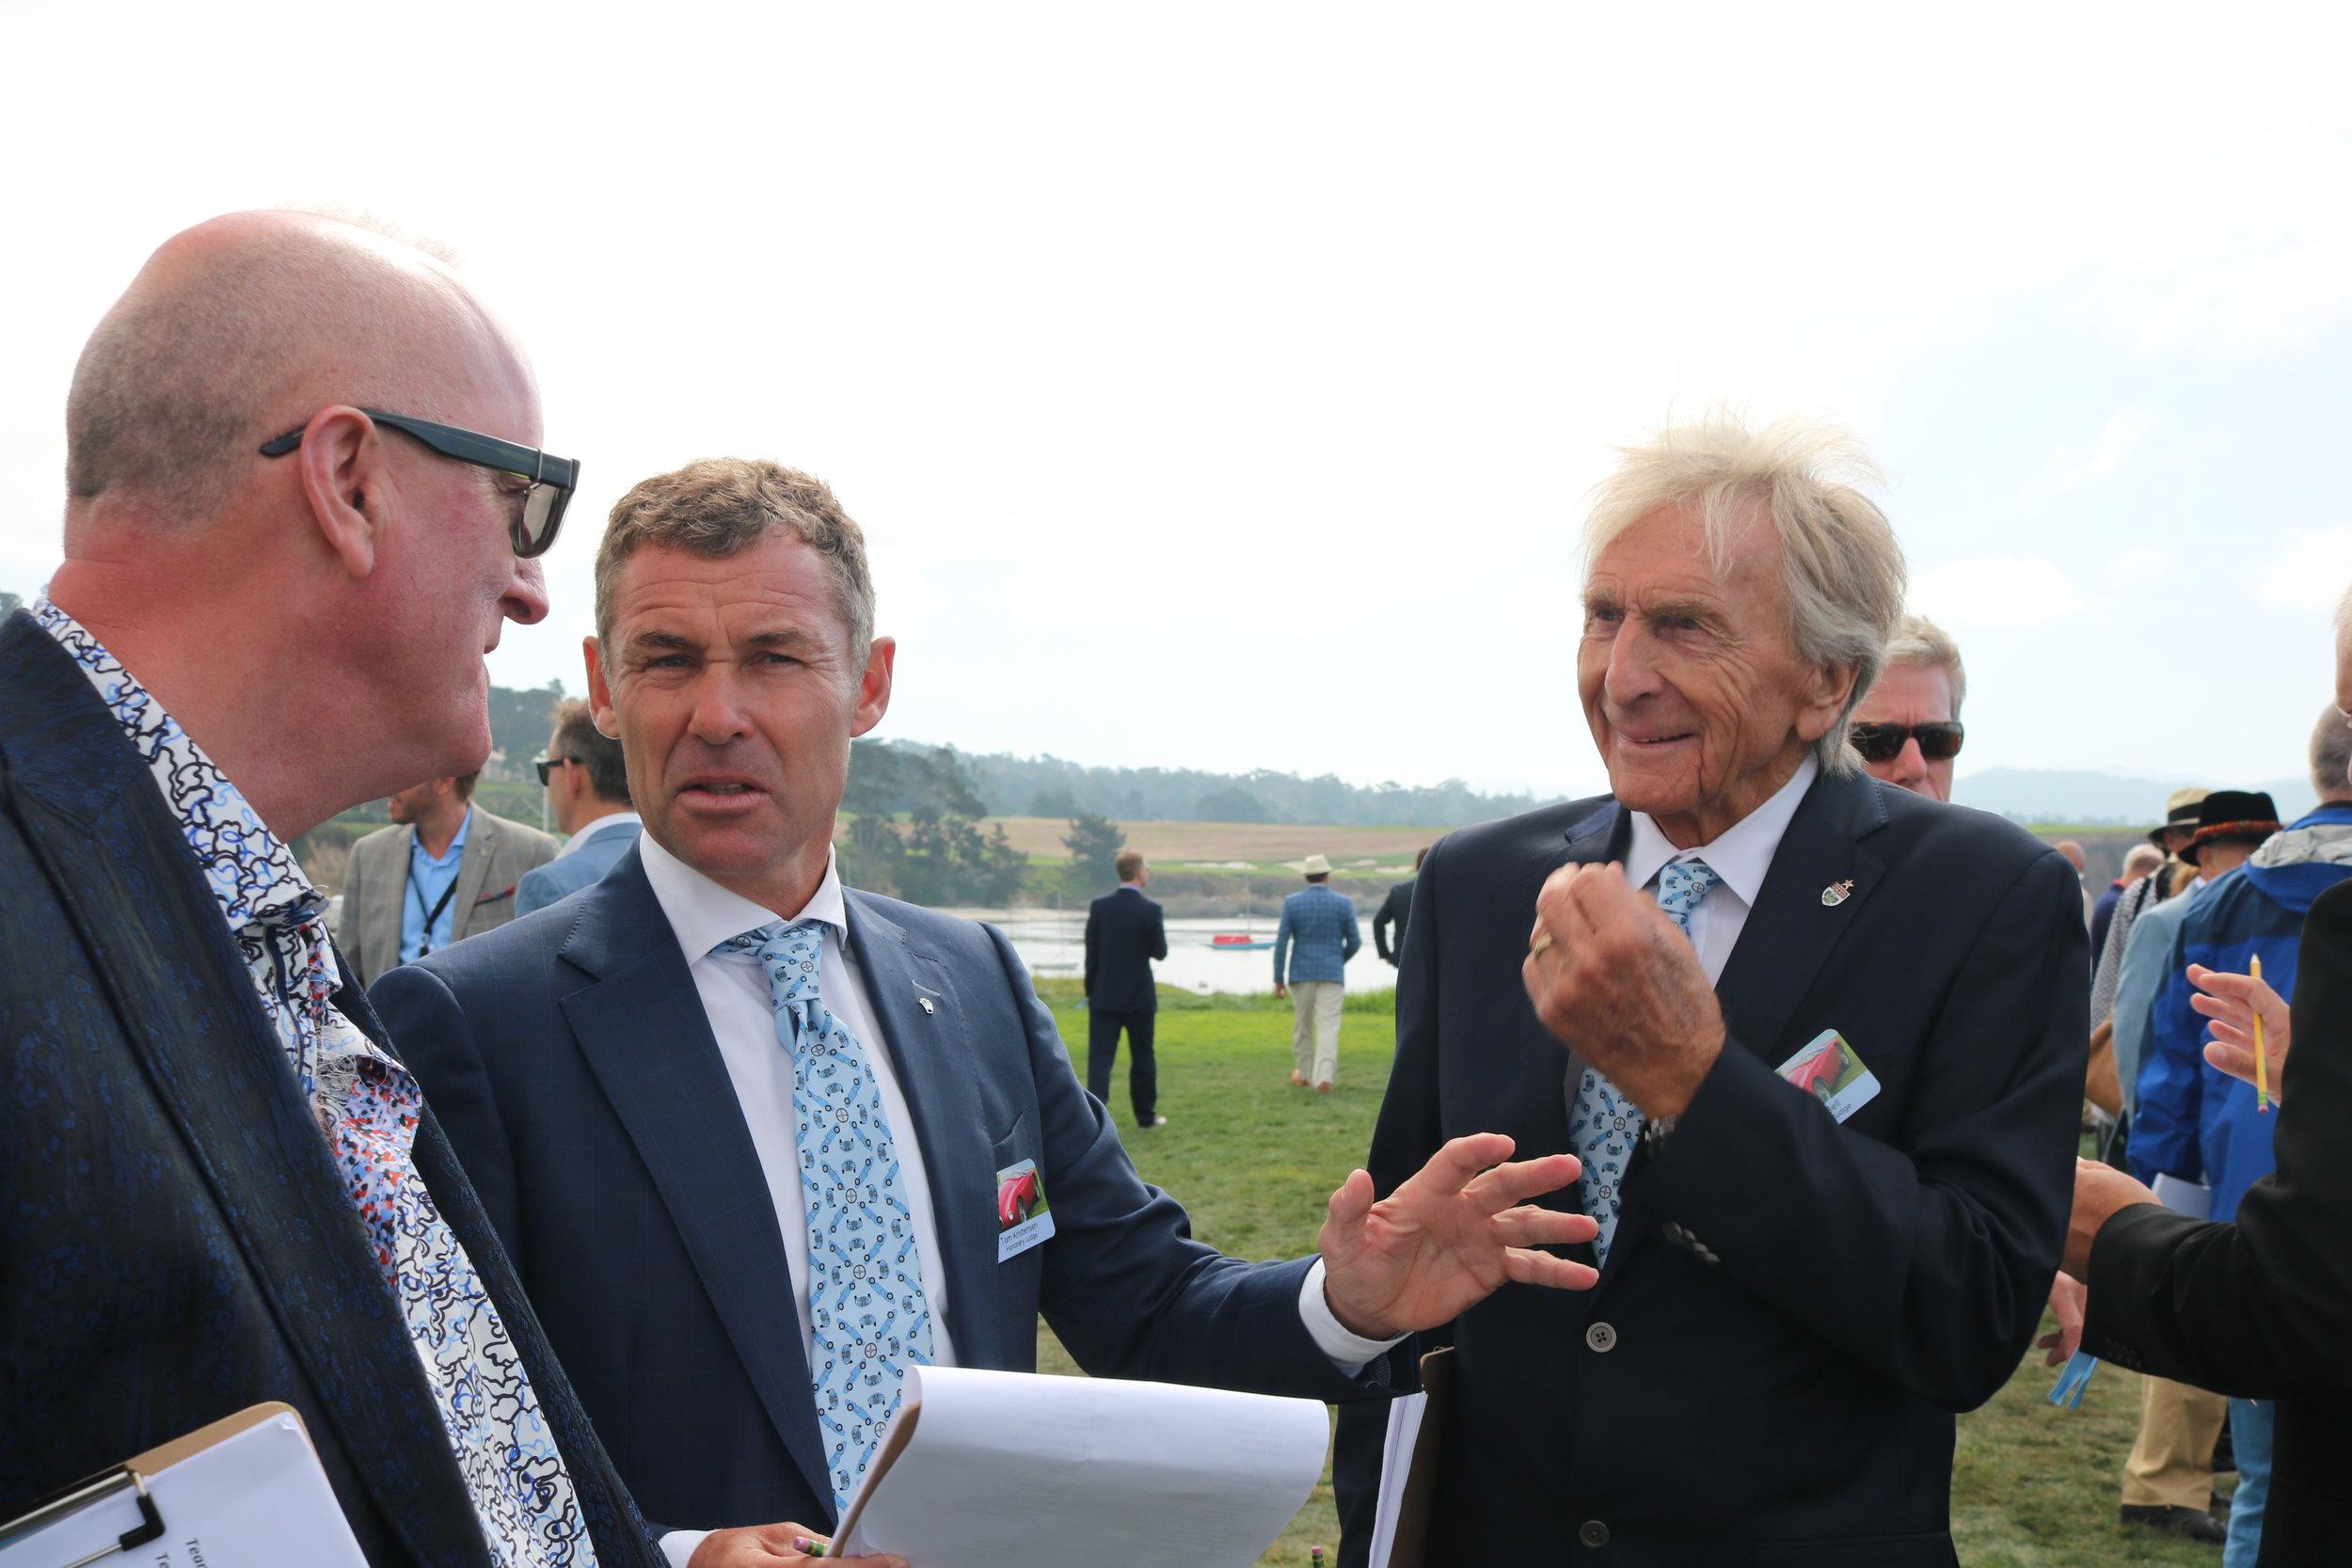 Le Mans Legends, Tom Kristensen and Derek Bell